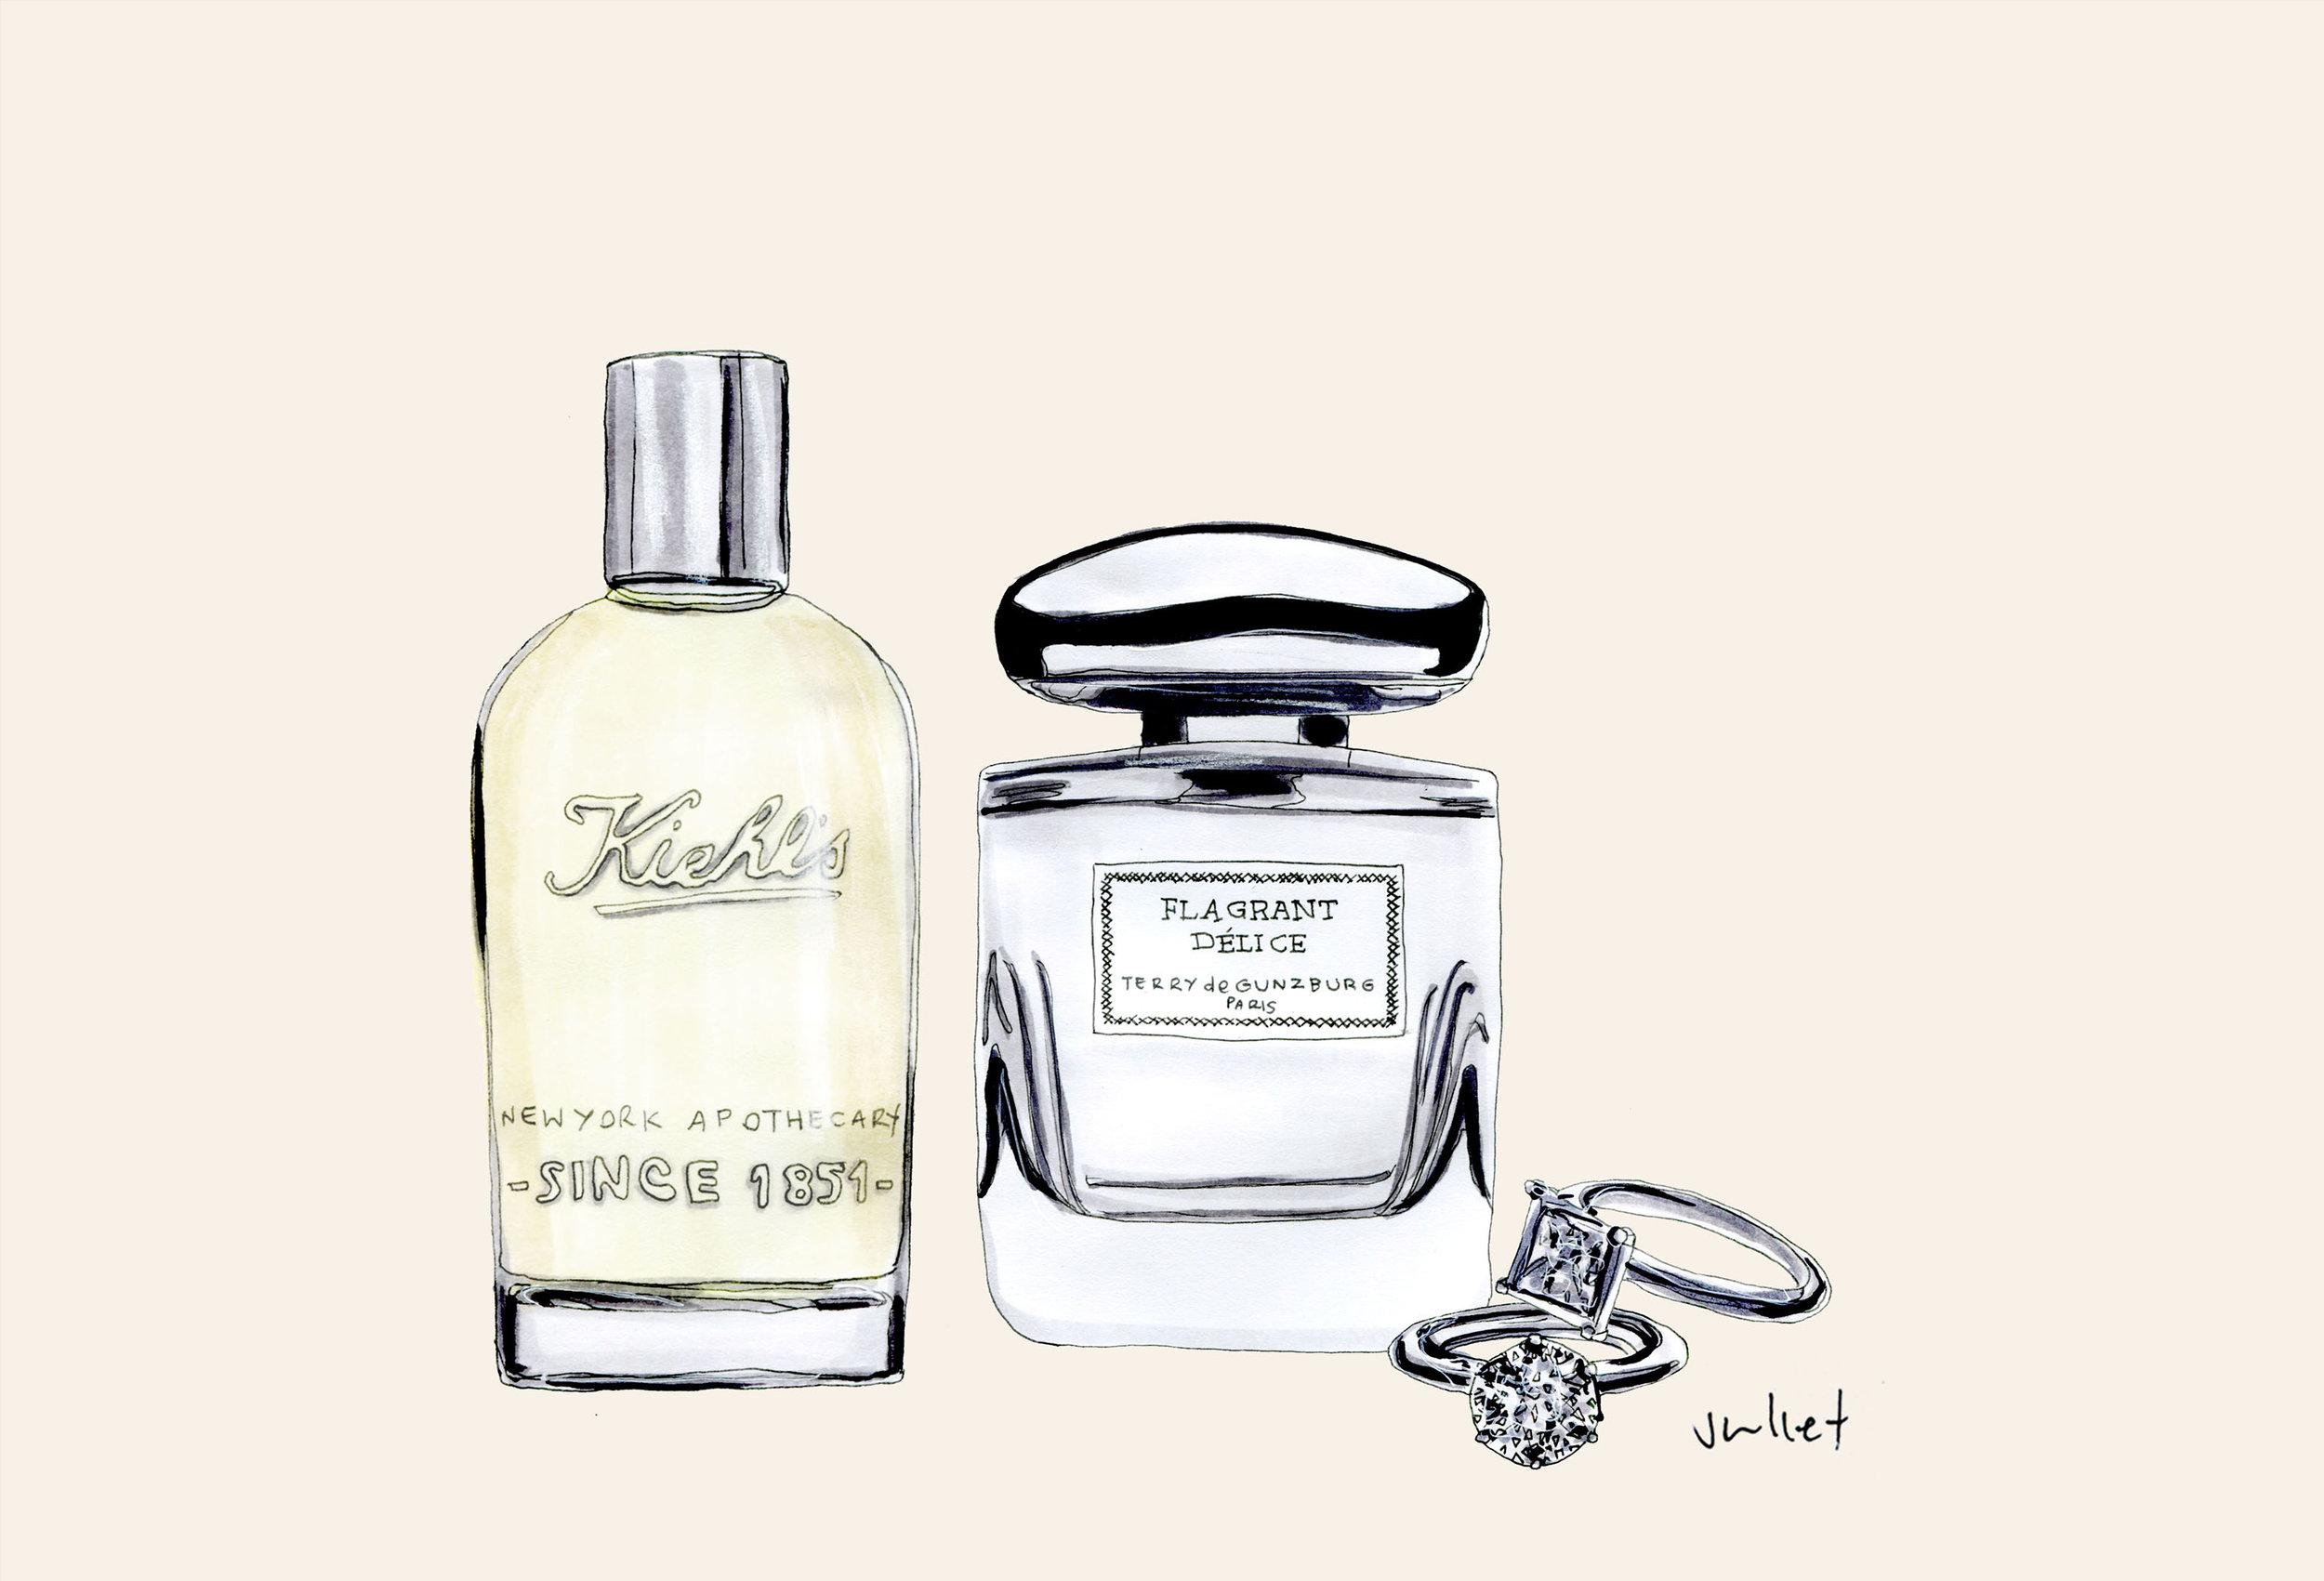 anna kendrick_fragrance_the juliet report